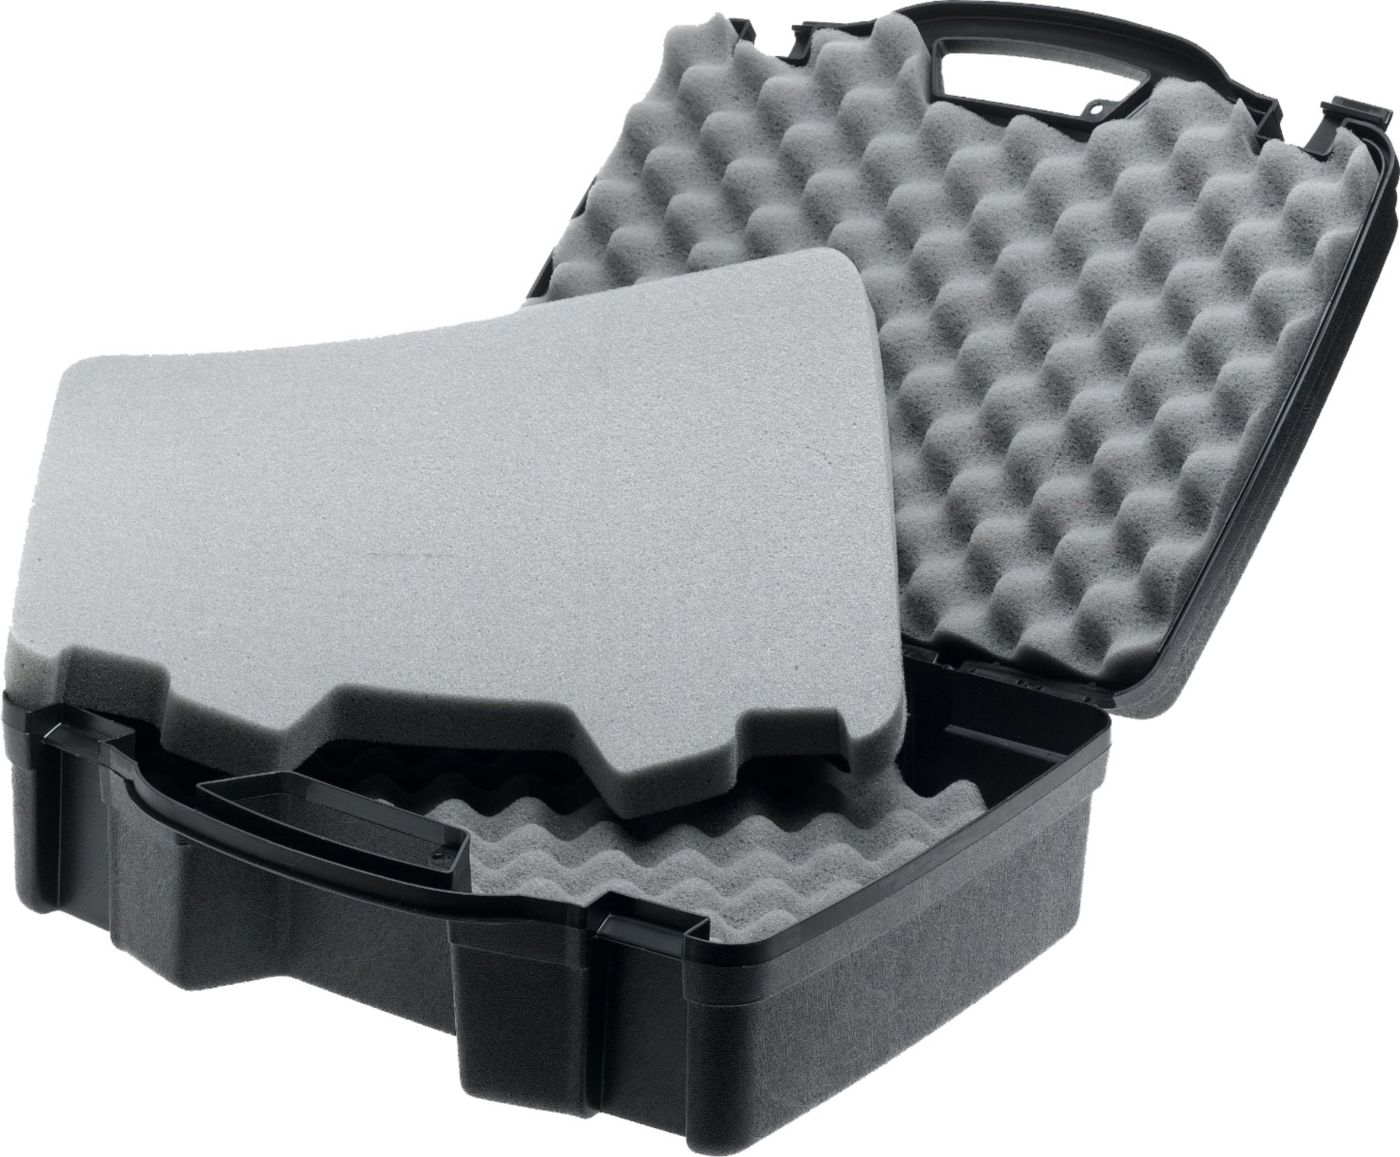 Plano Protector Four Pistol Case